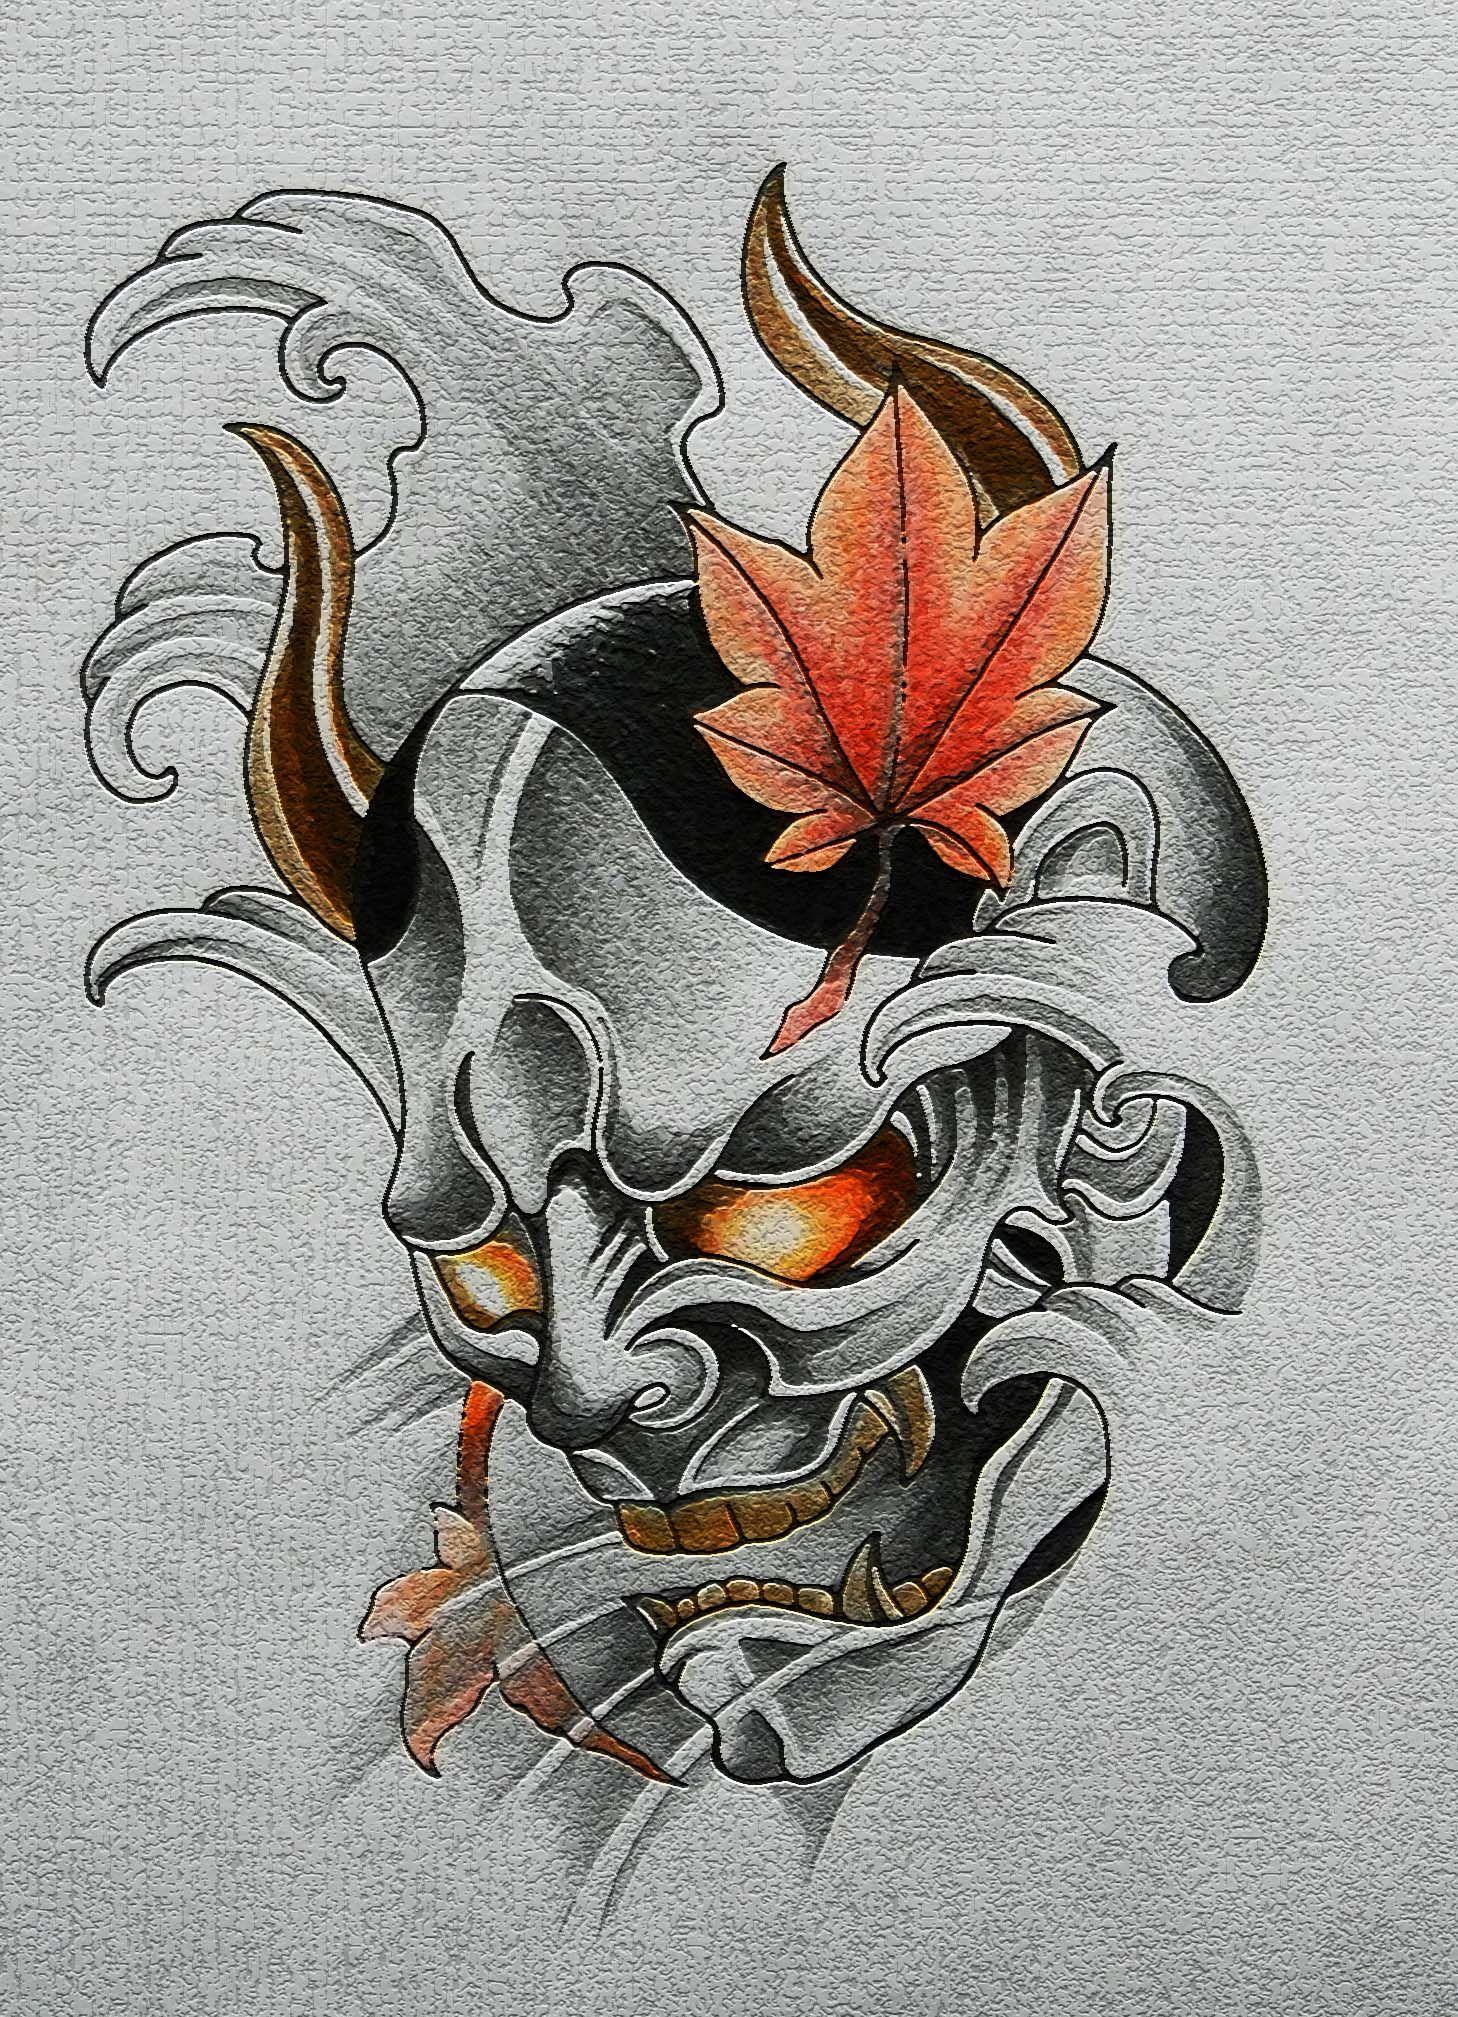 tattoo design japanese tattoos. Black Bedroom Furniture Sets. Home Design Ideas